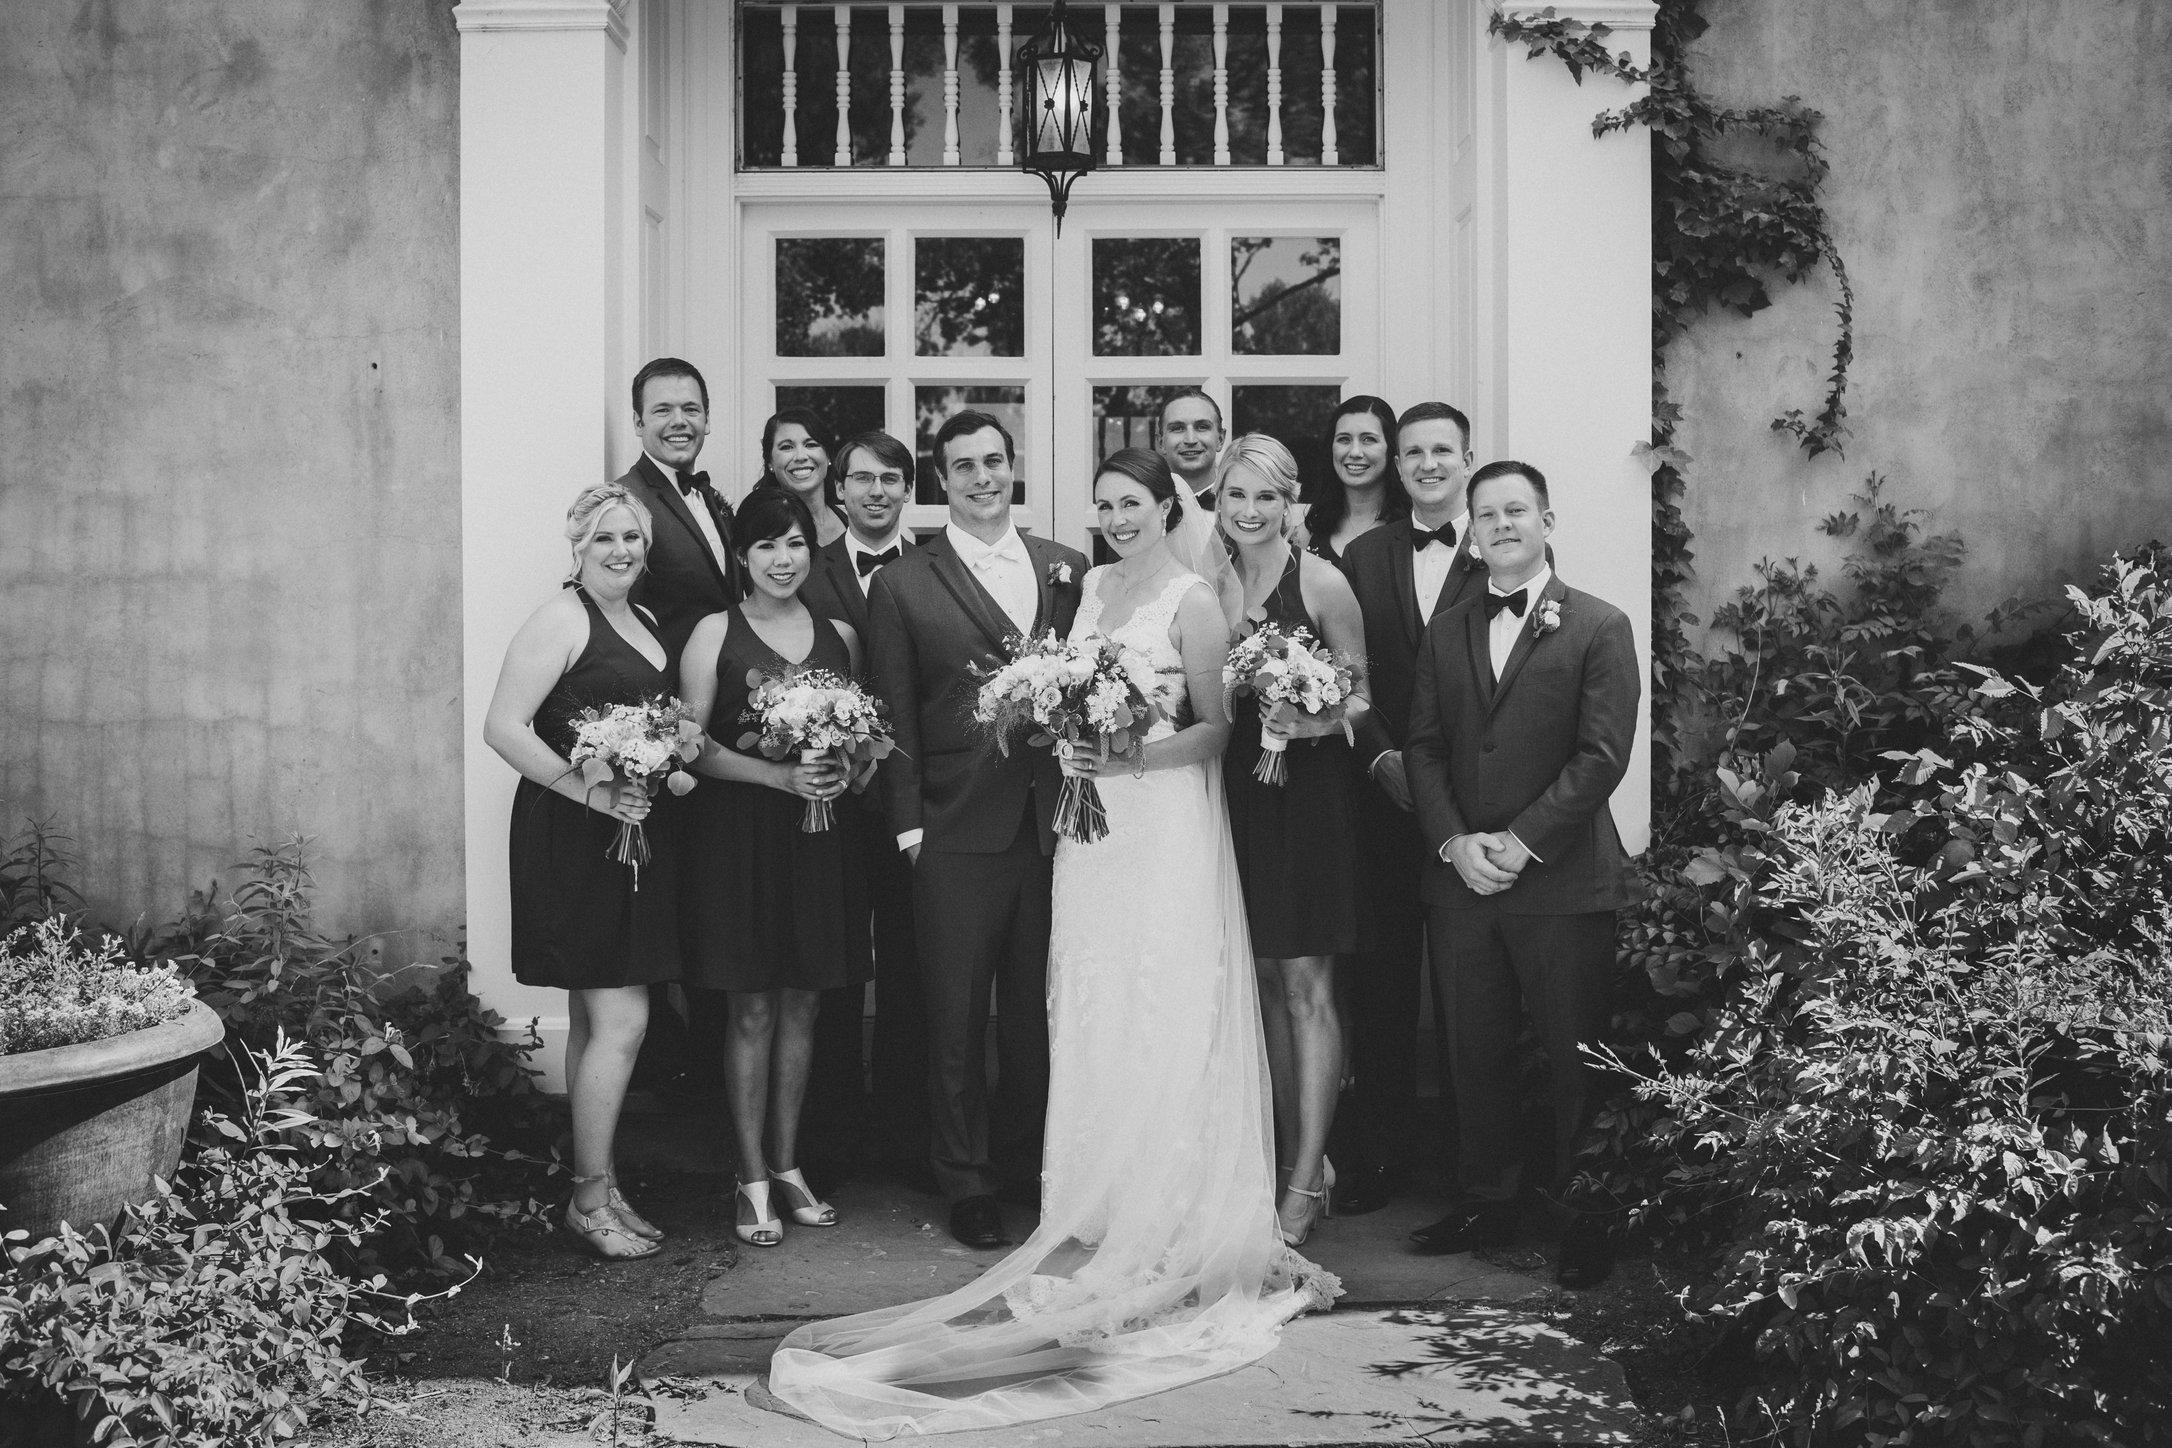 SandC-wedding-342.jpg